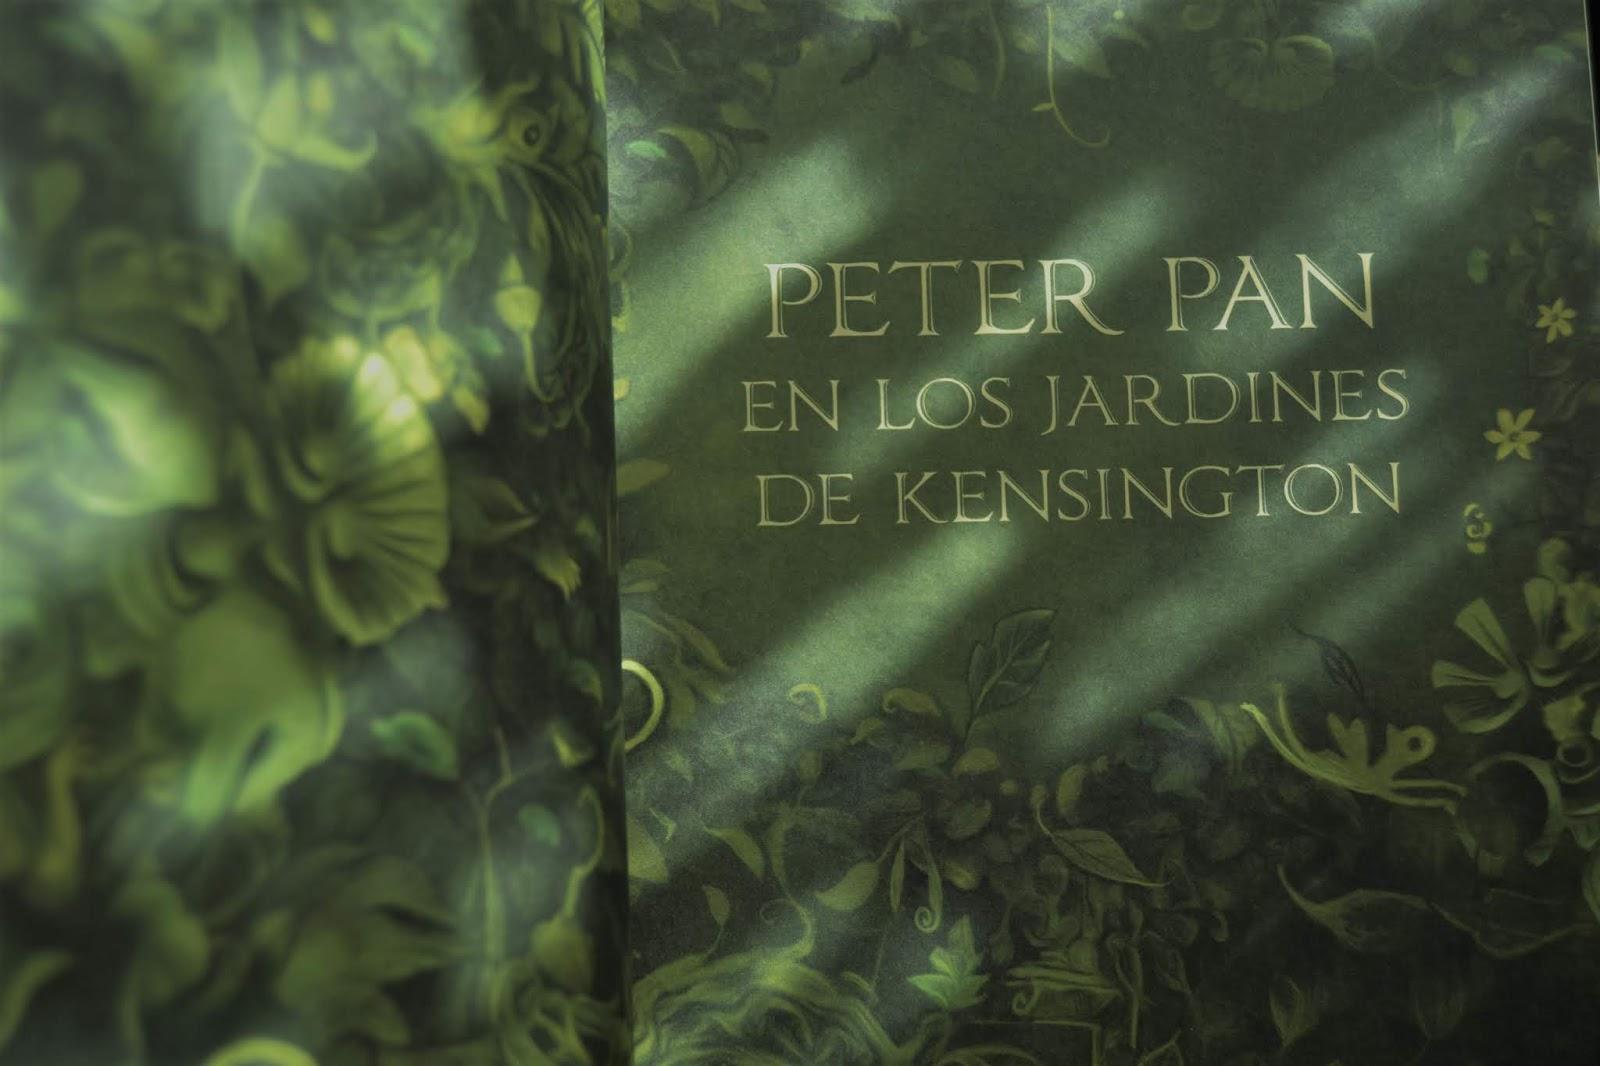 6 libros ilustrados que debes tener, Canço de Fer Camí, Peter Pan, Ondina, Carmen, Hermanas, Pelea como una chica